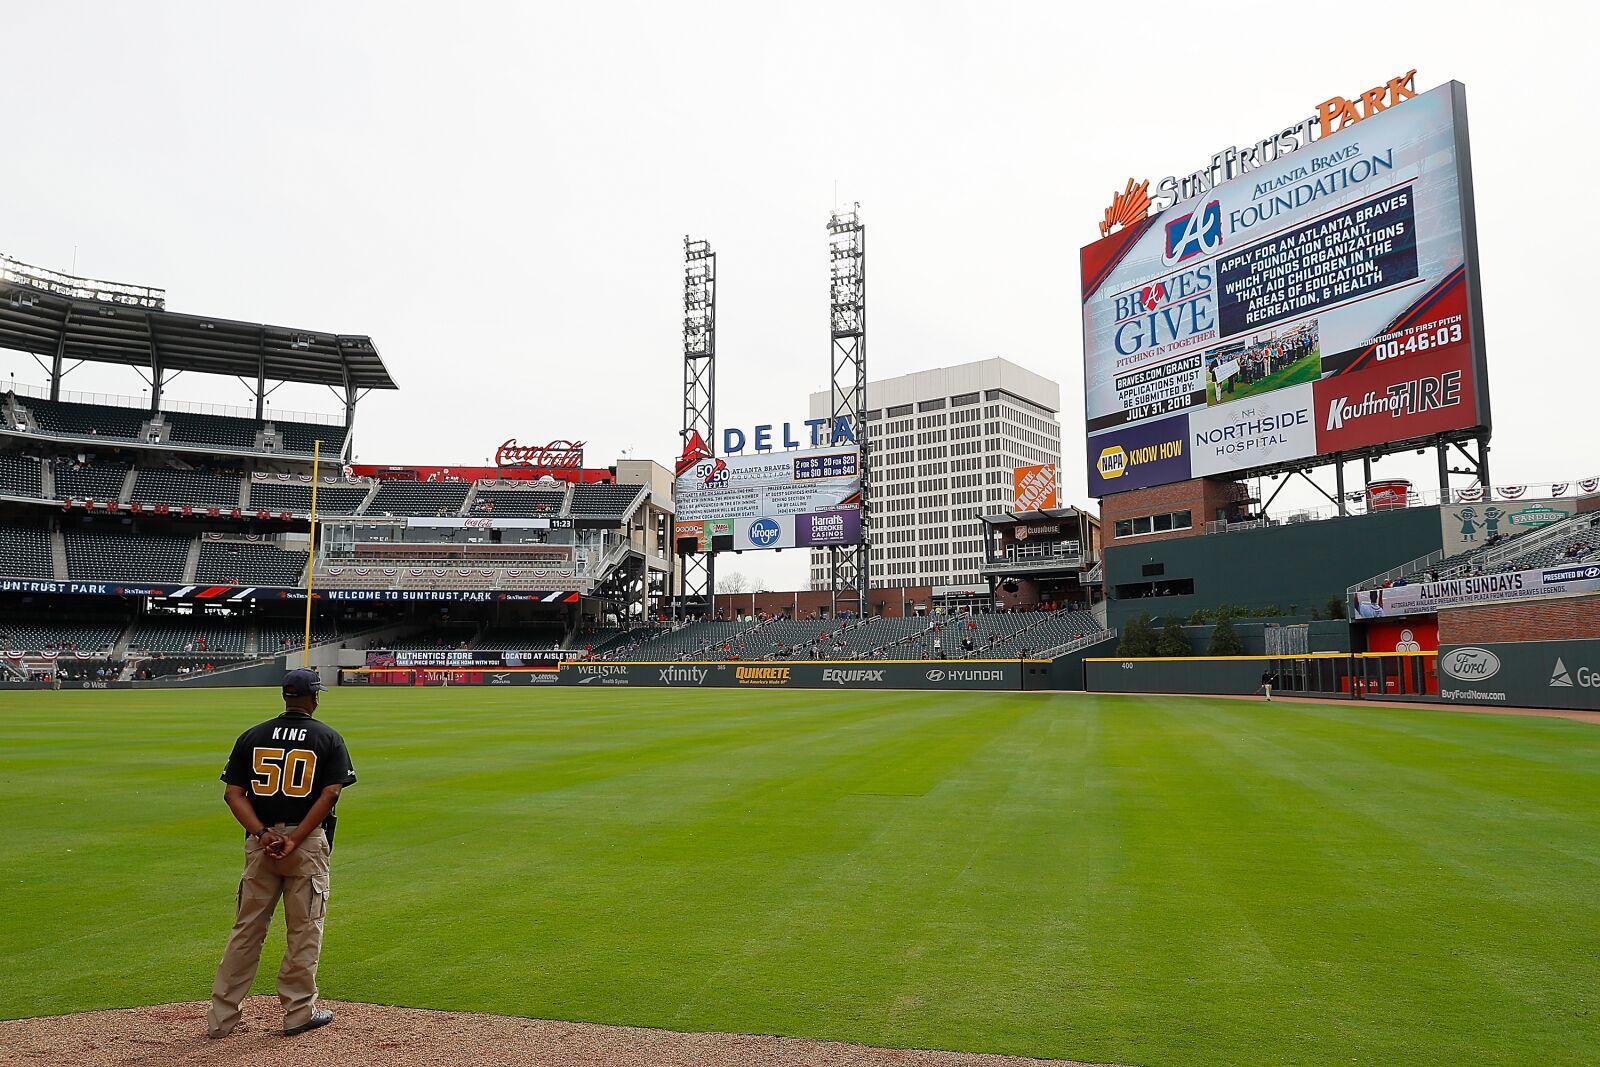 buy online b4a8e 29fa5 Atlanta Braves: STP Stumbles Raise Warning Flags